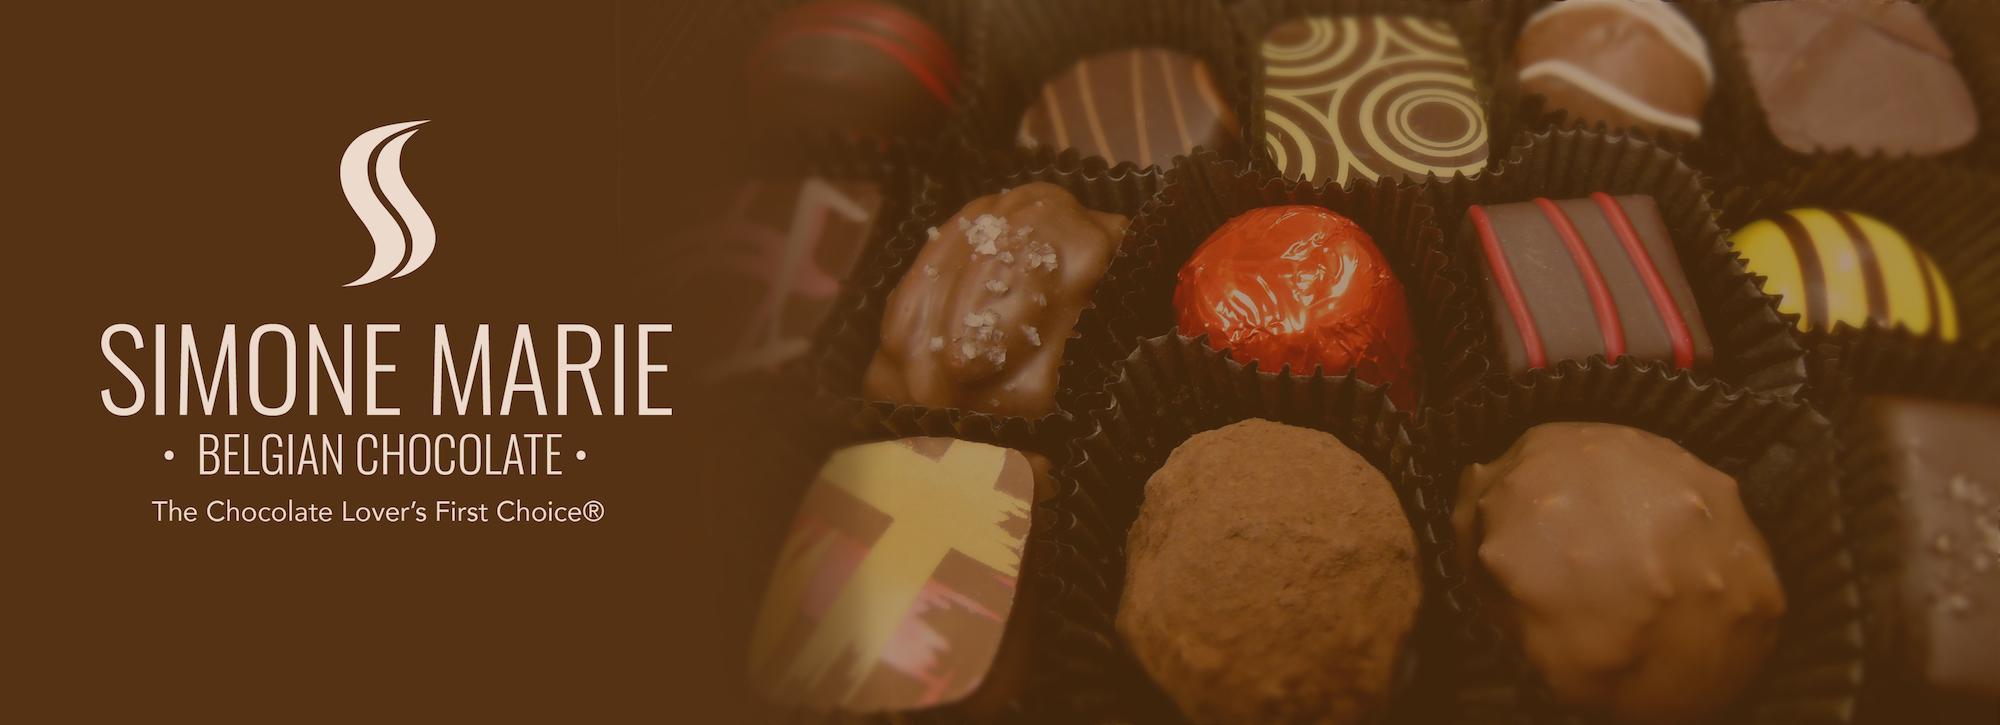 Simone Marie Belgian Chocolate